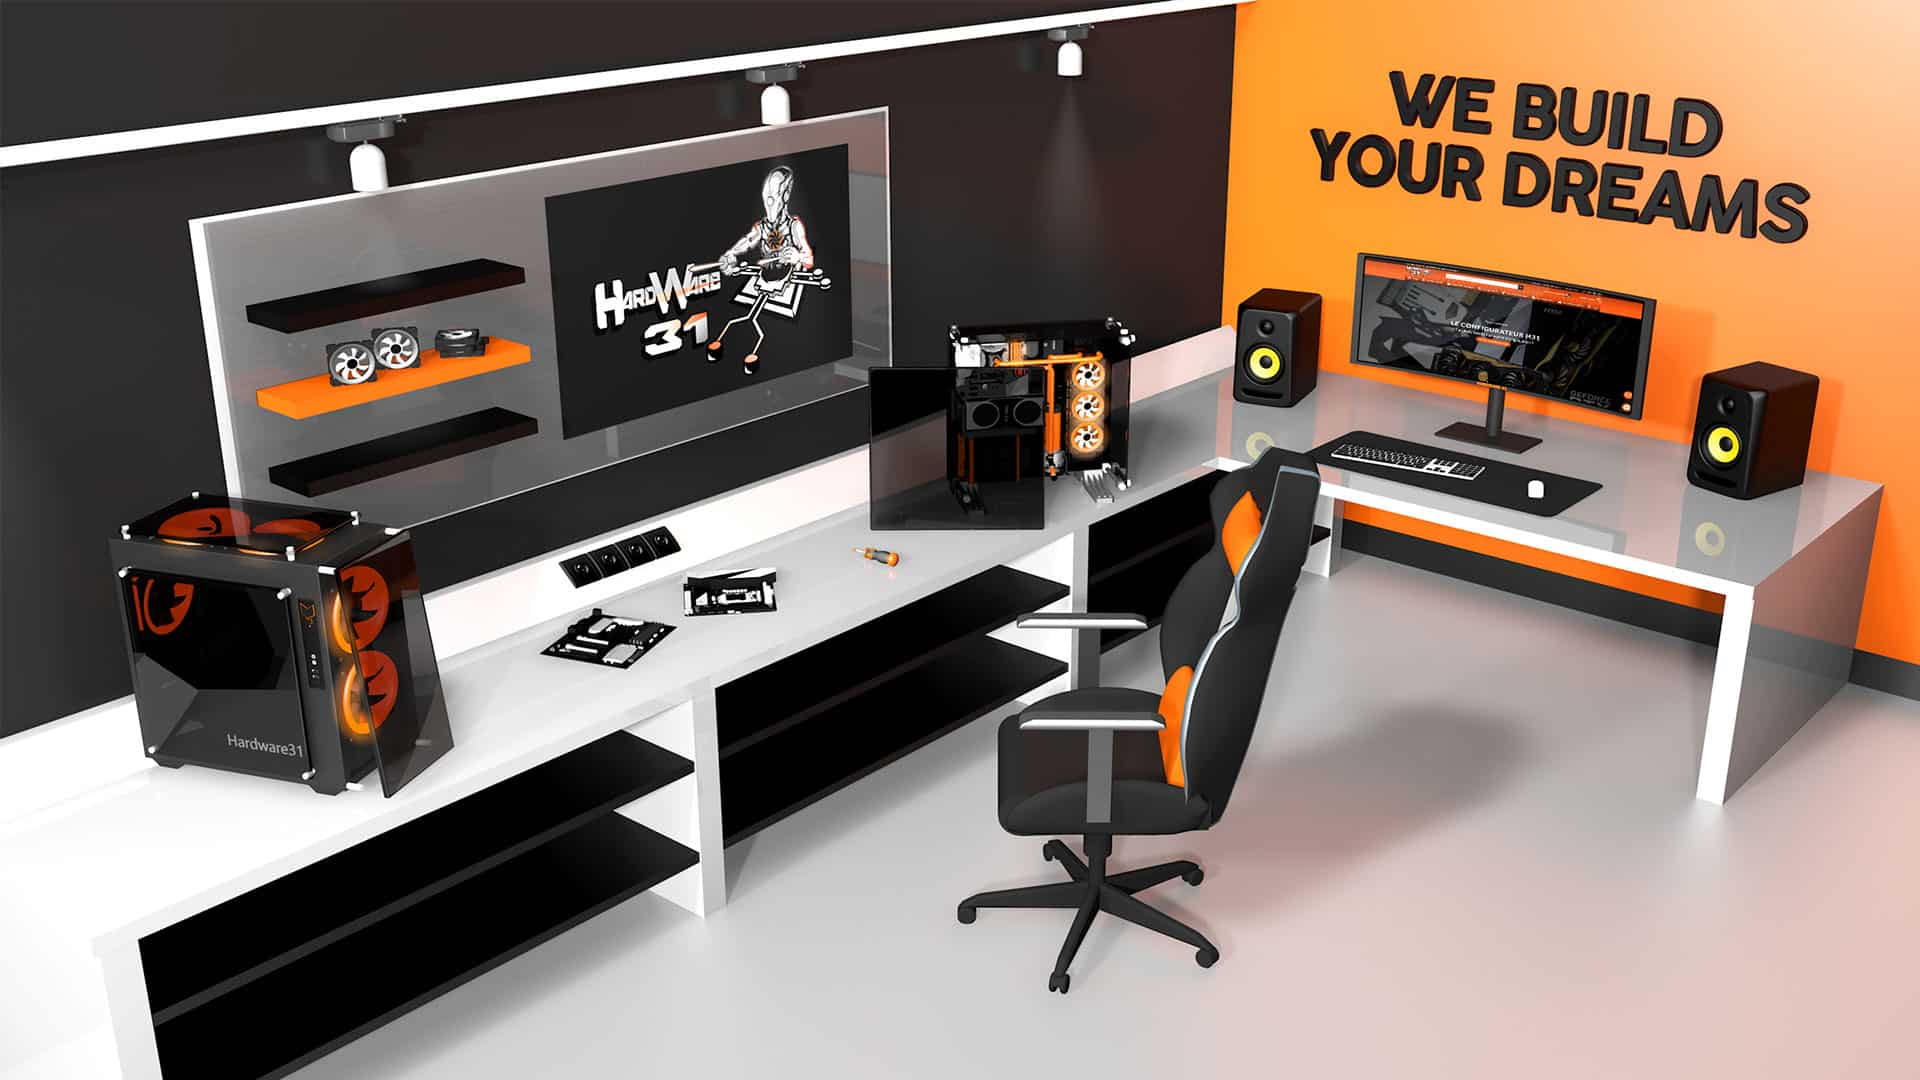 L'atelier Hardware31